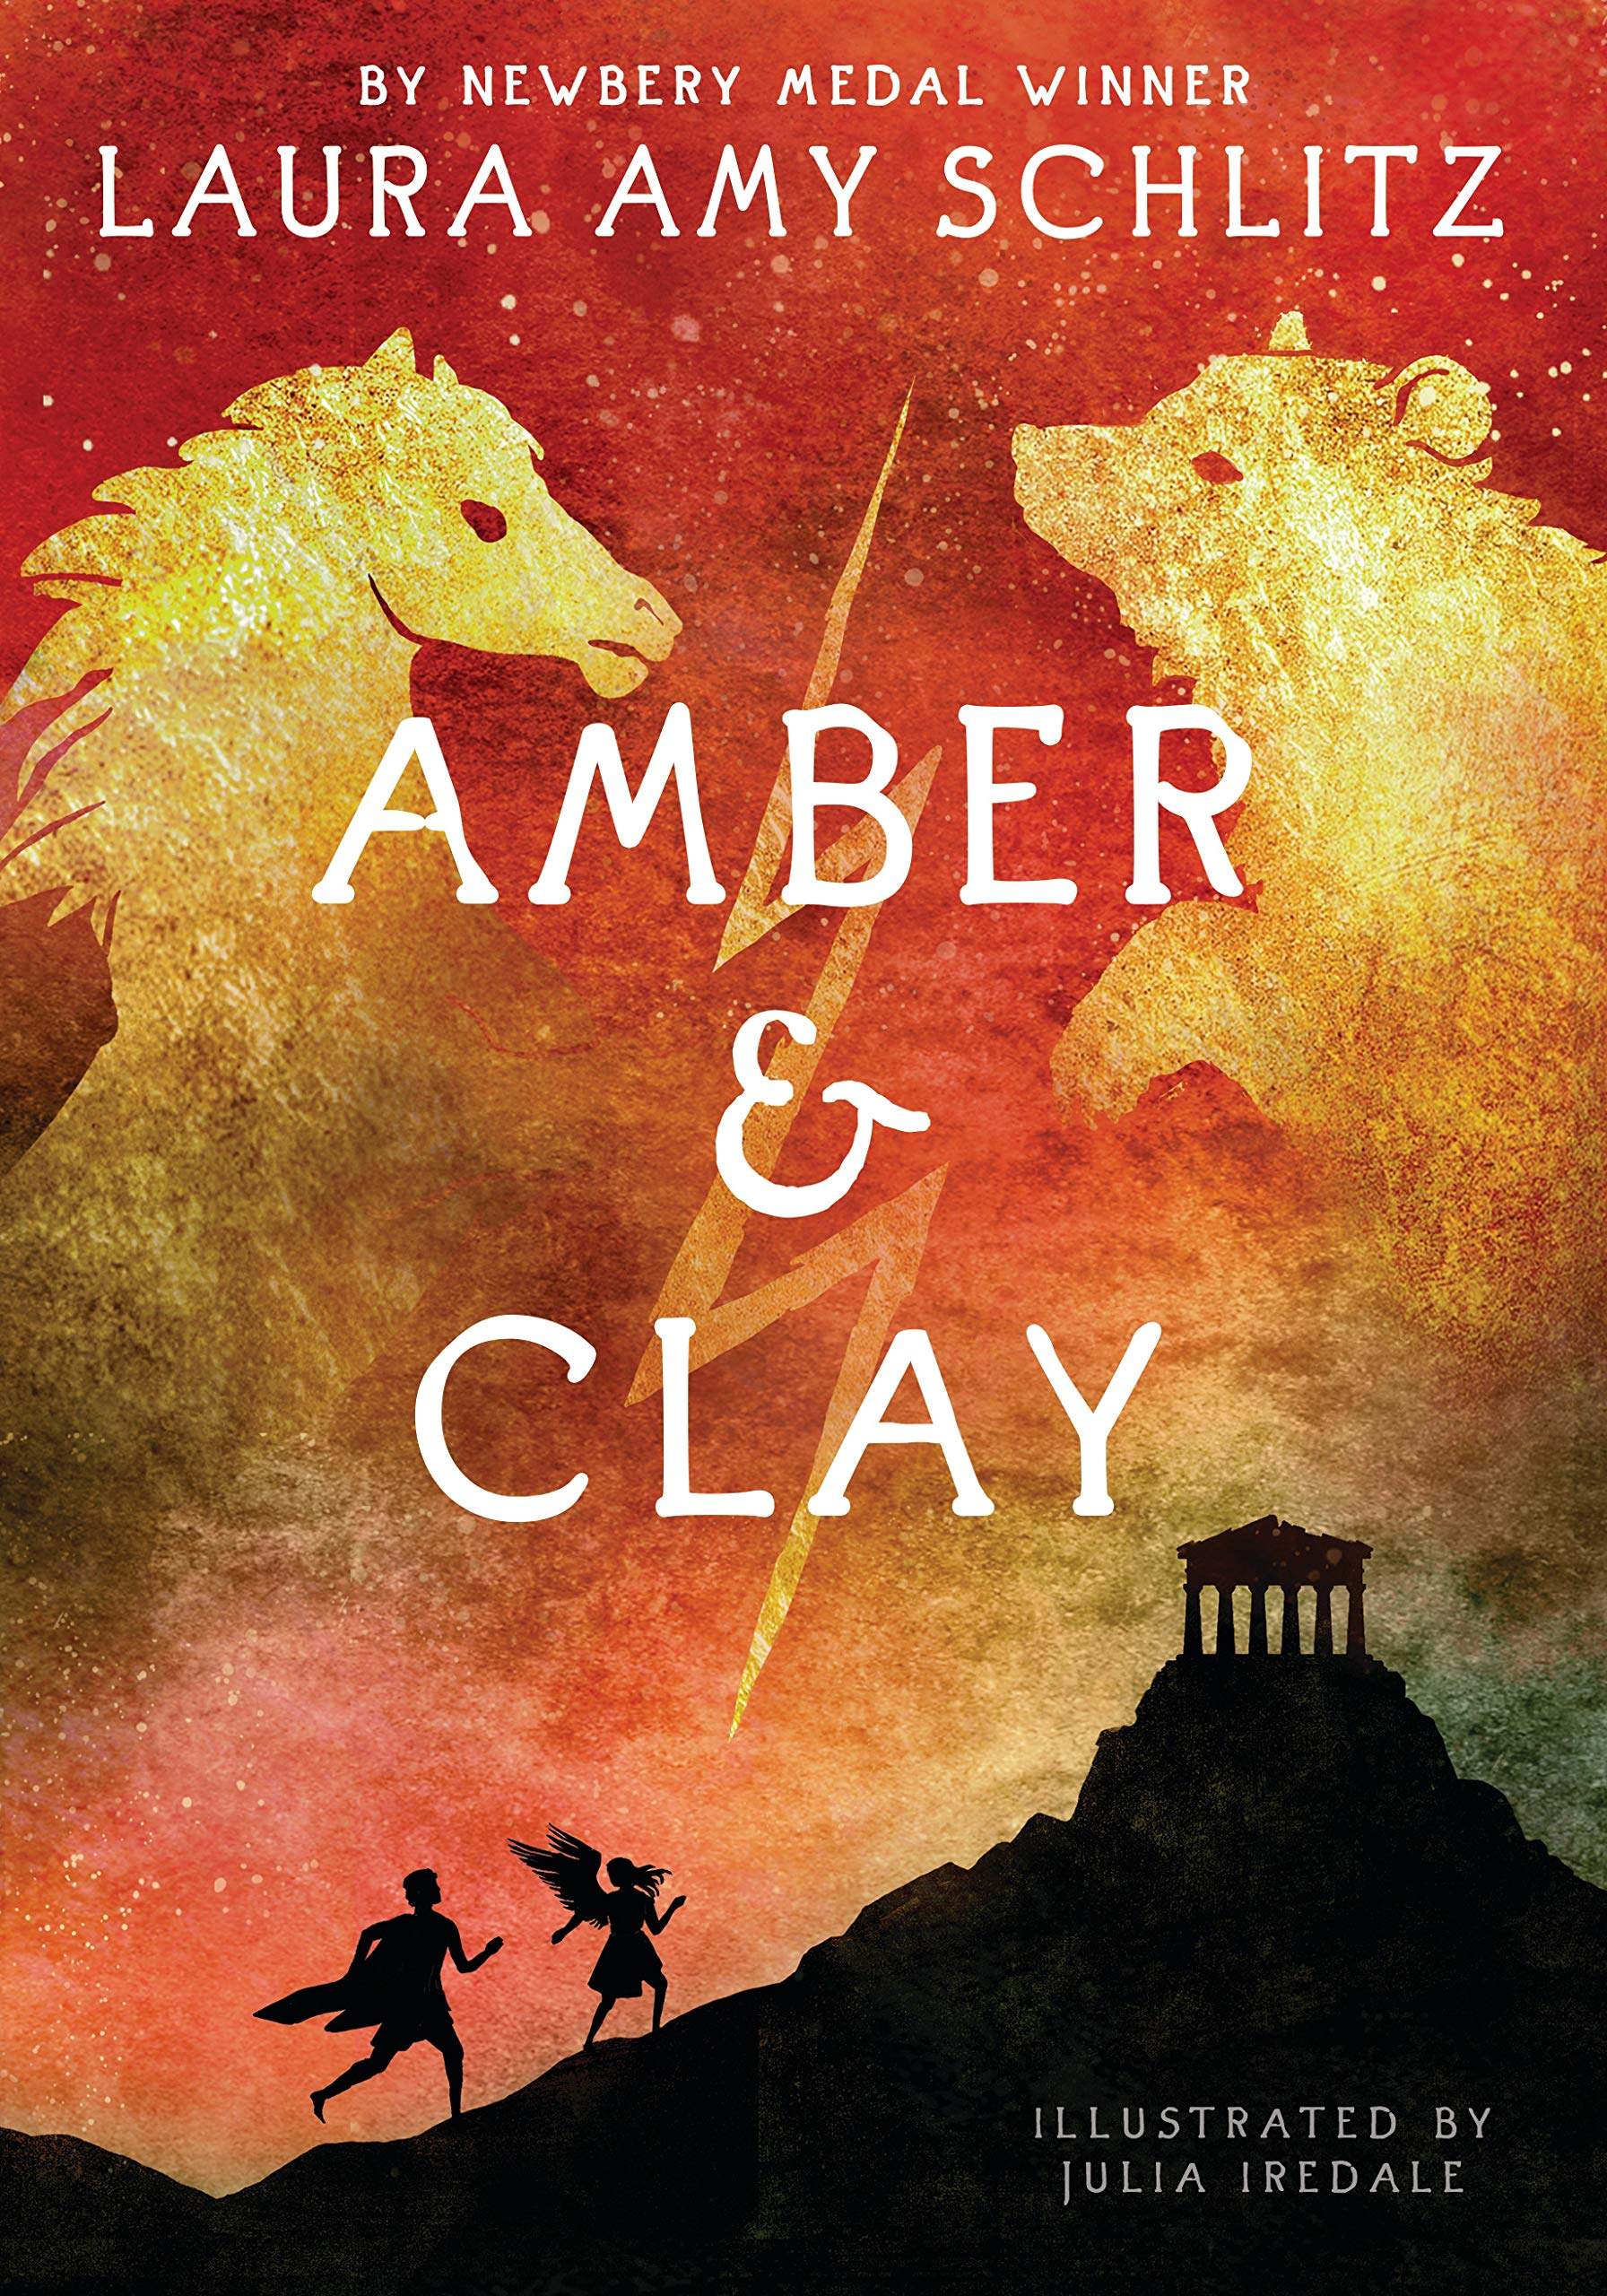 Amazon.com: Amber and Clay (9781536201222): Schlitz, Laura Amy, Iredale,  Julia: Books